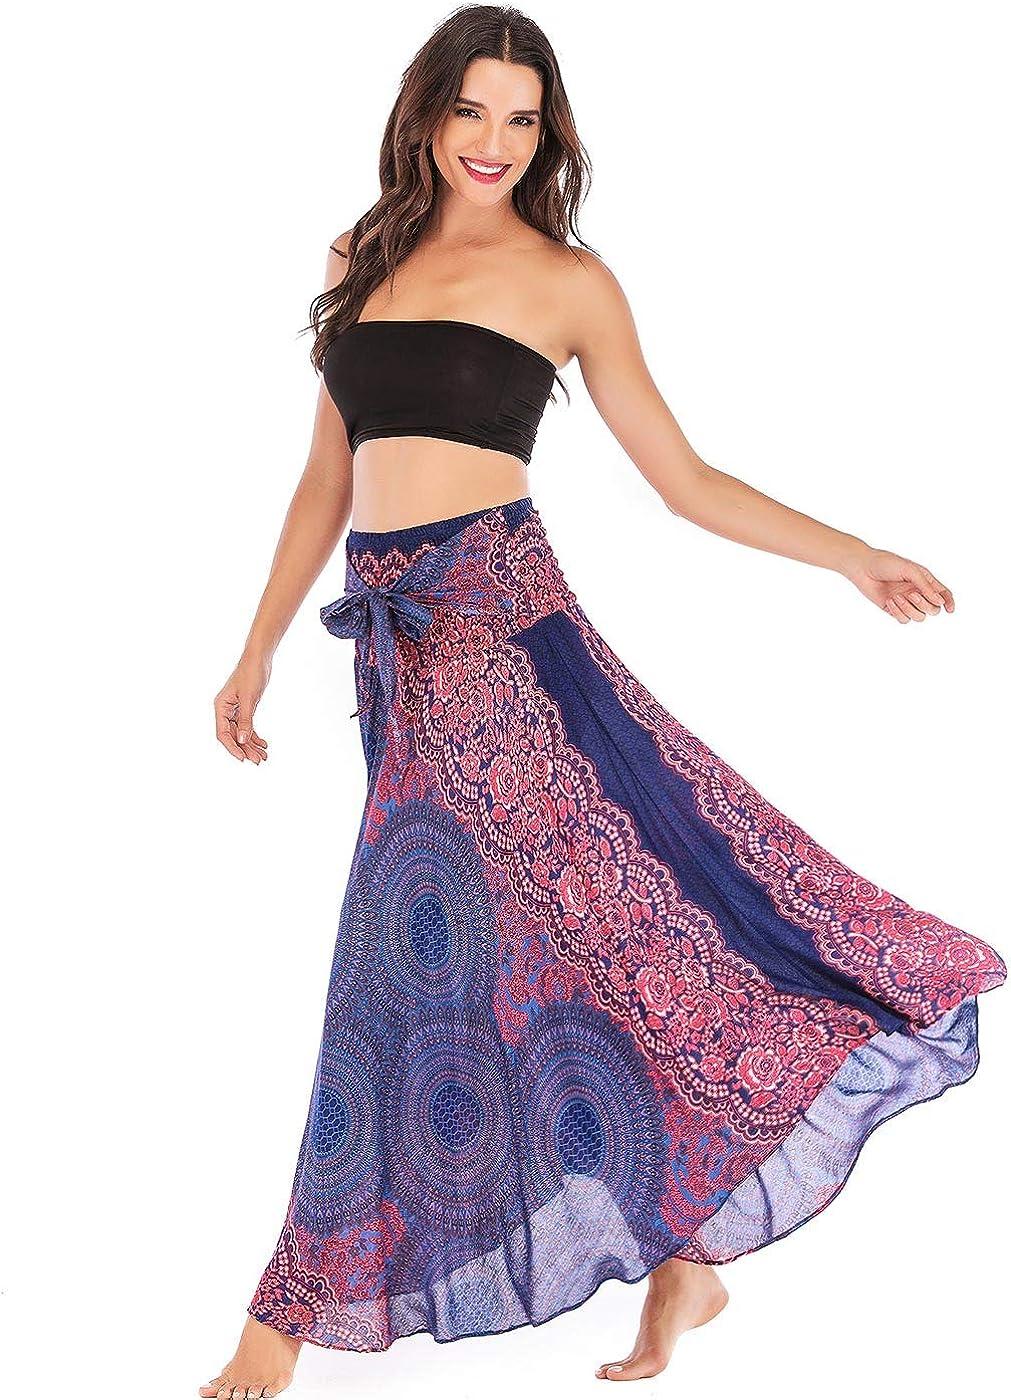 FEOYA Women's Flowy Bohemian Dress Gypsy Print Maxi Skirt Long Skirt  Original 20 in 20 Wrap Skirts